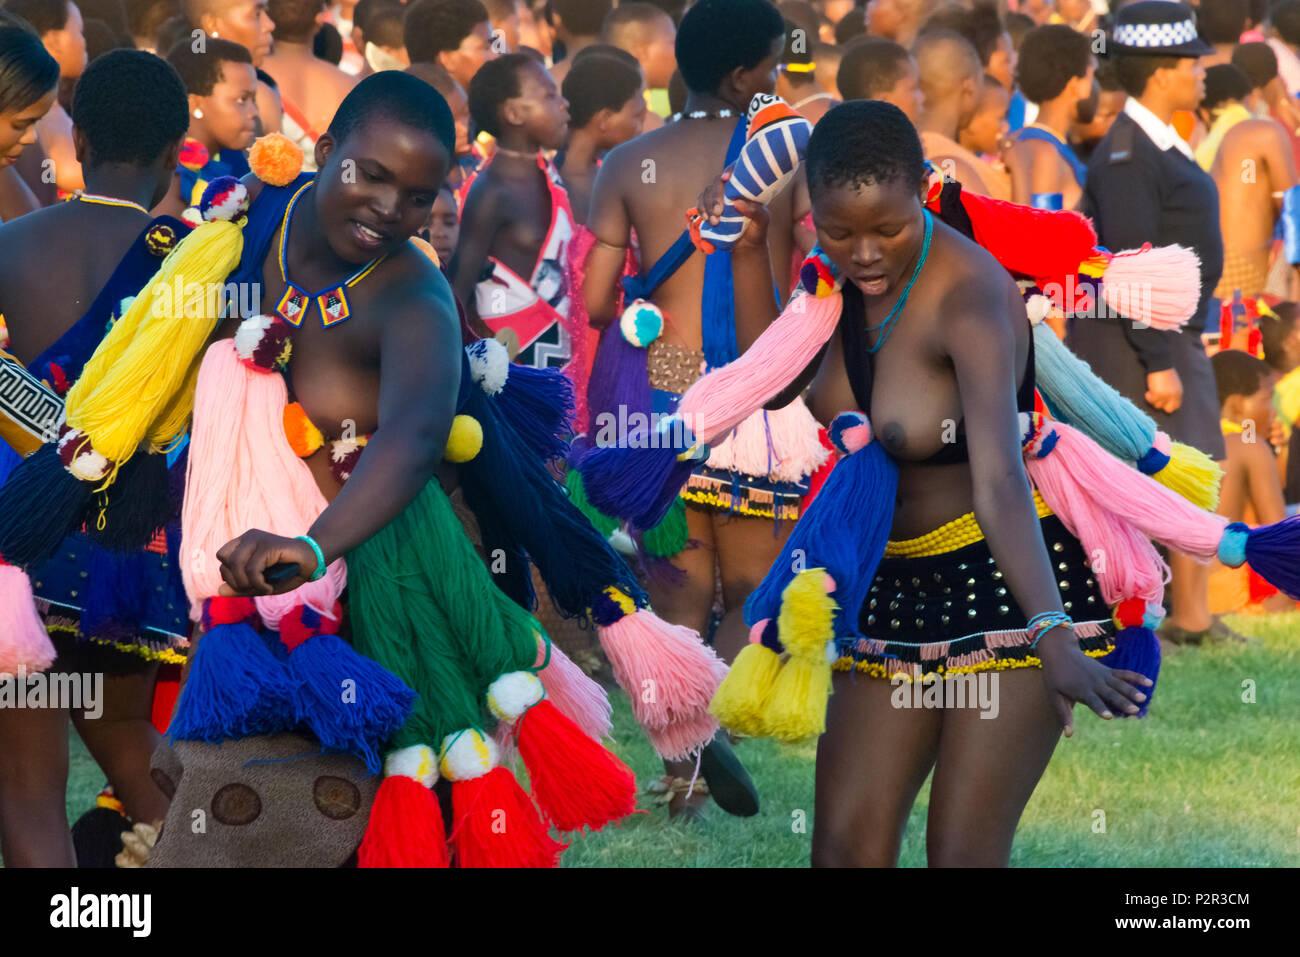 swazi girls parade at umhlanga reed dance festival swaziland rh alamy com swaziland flag swaziland currency